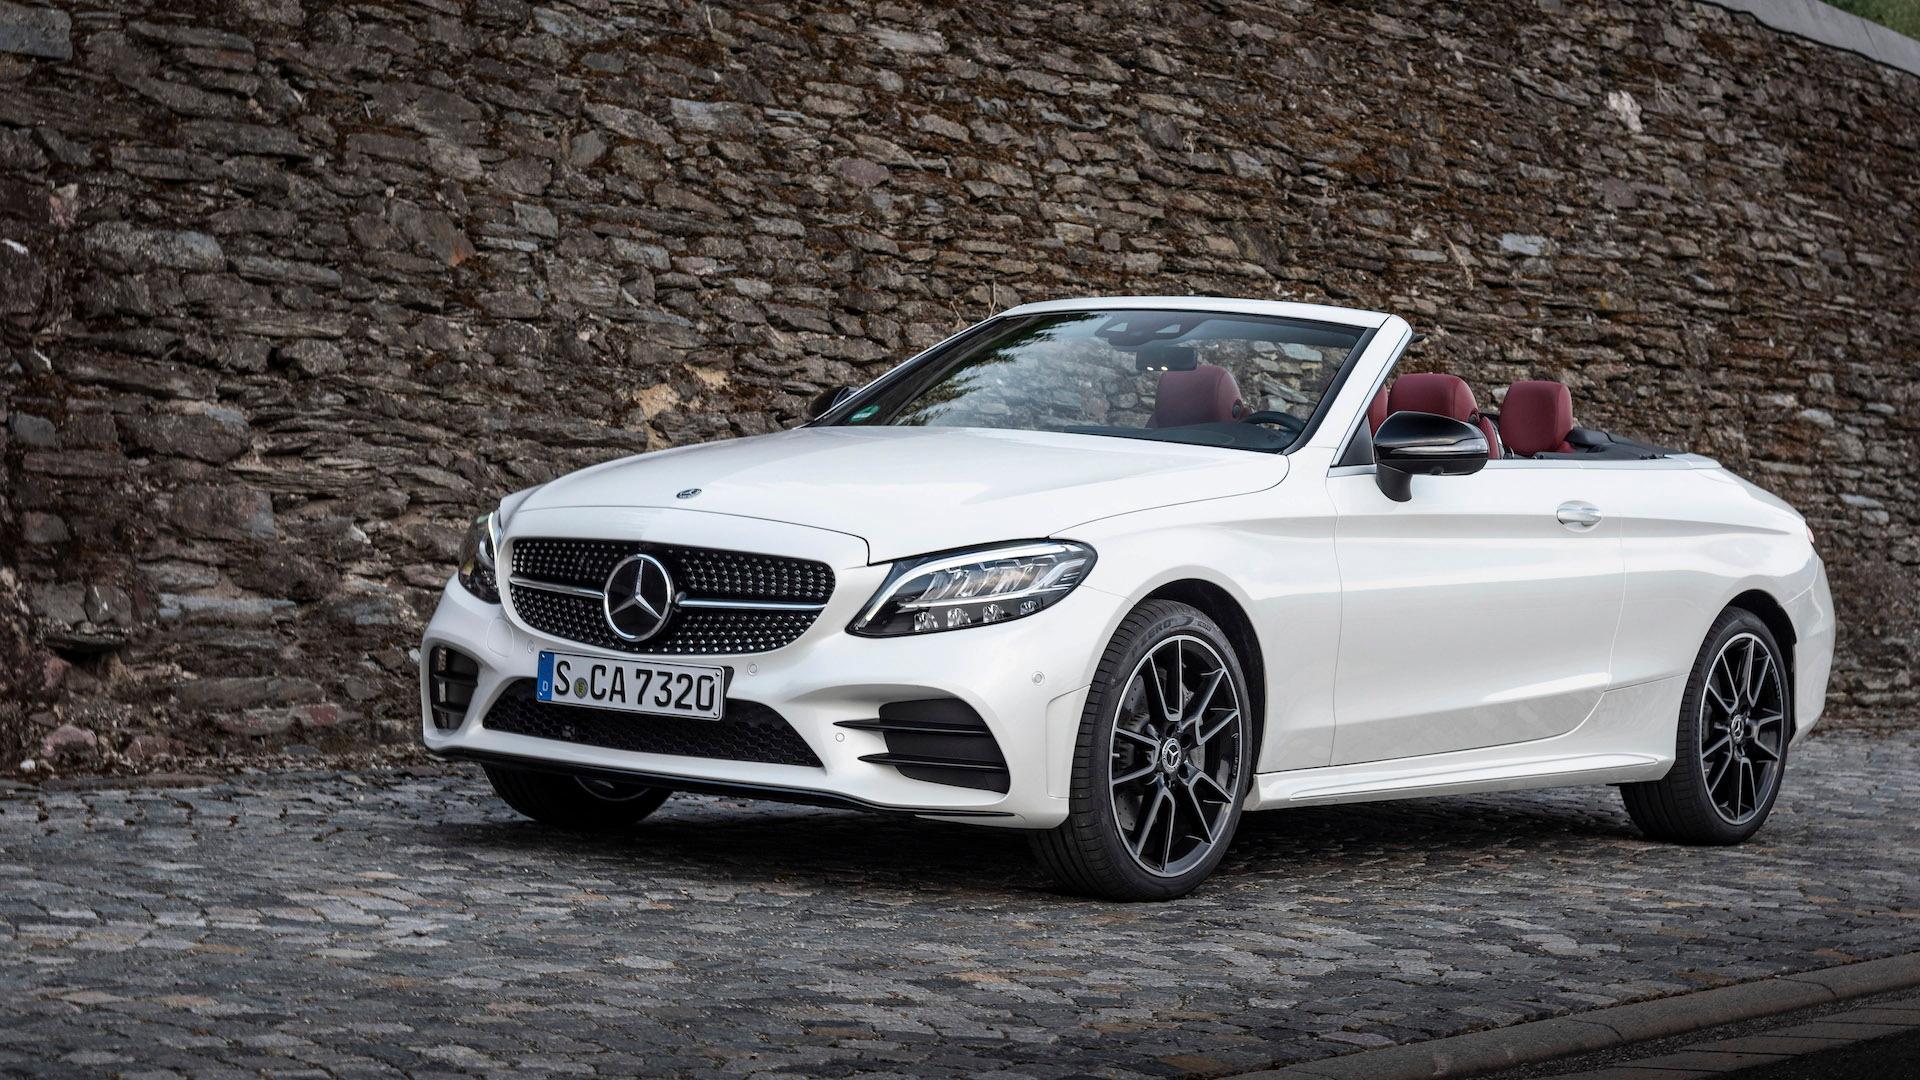 2019 Mercedes-Benz C-Class (C300 Cabriolet)